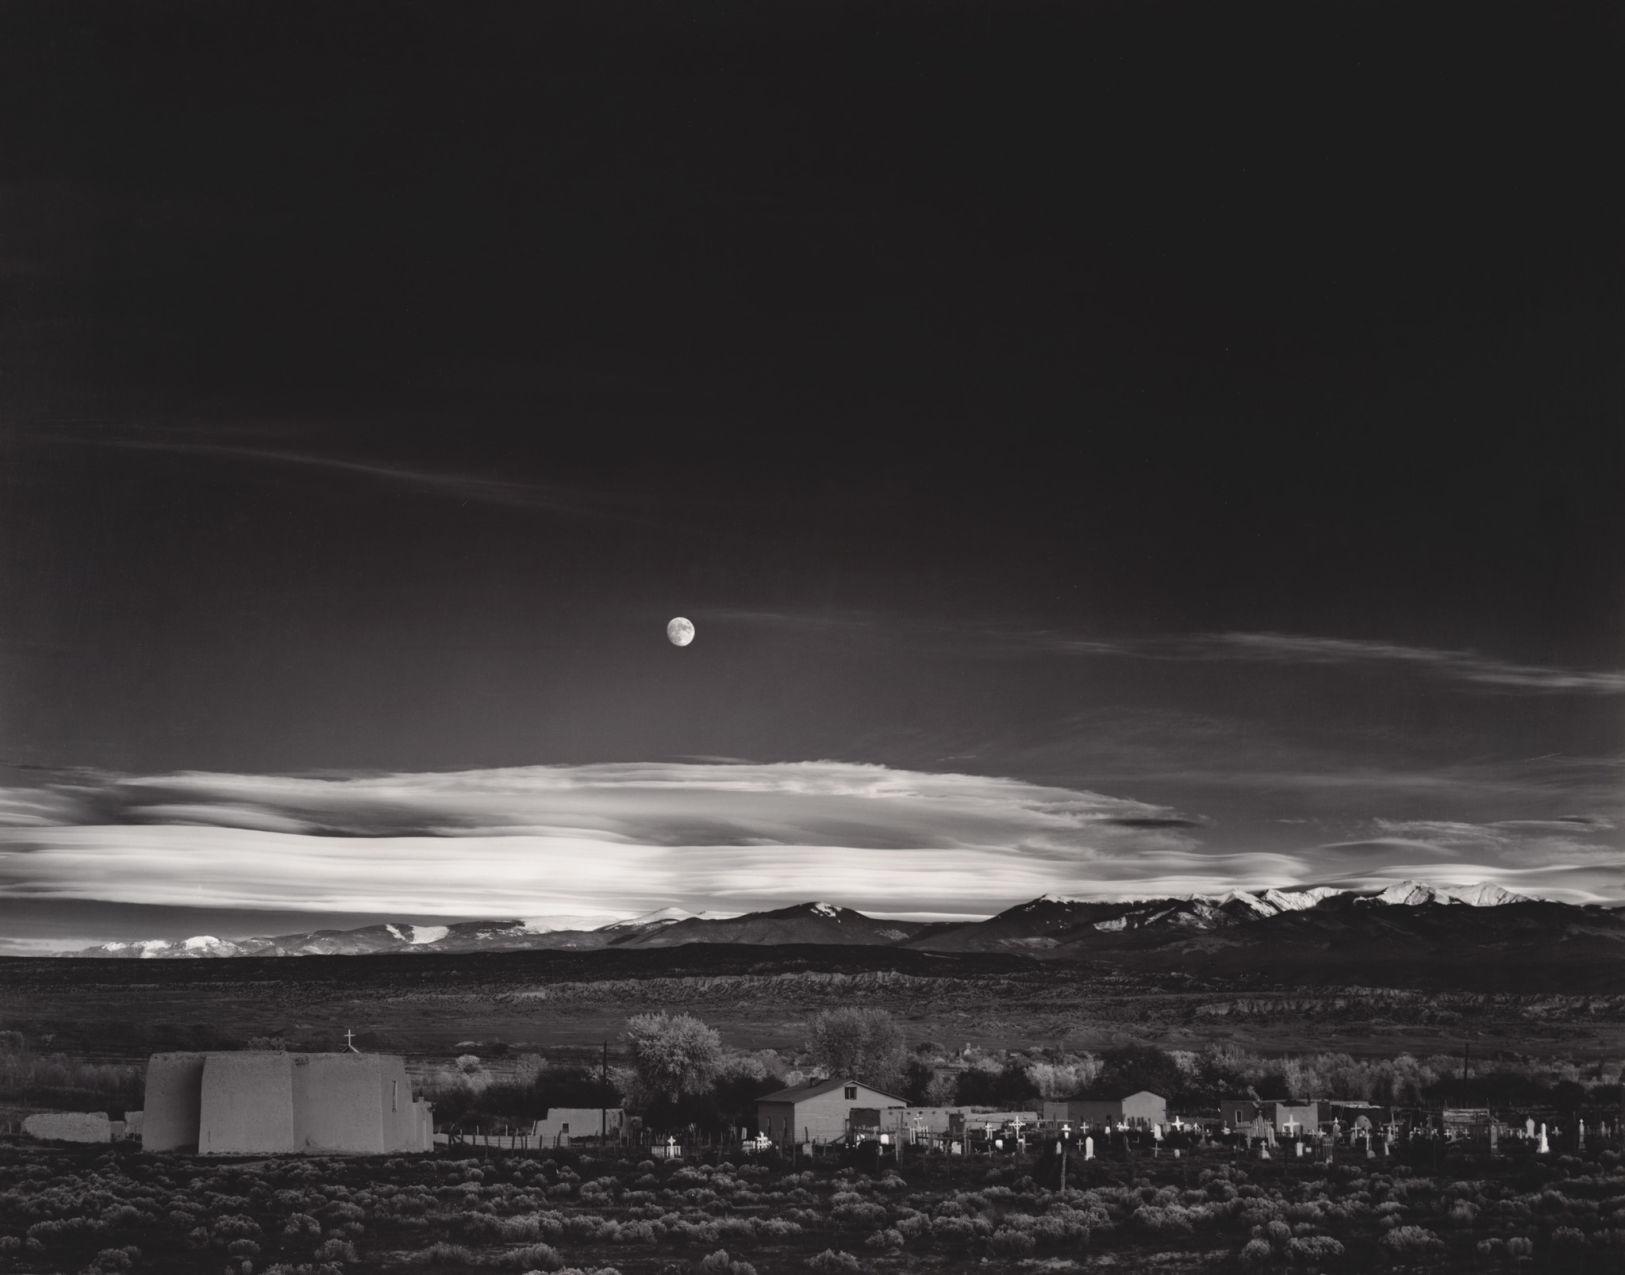 New University of Arizona exhibit will reveal some of Ansel Adams' photography secrets